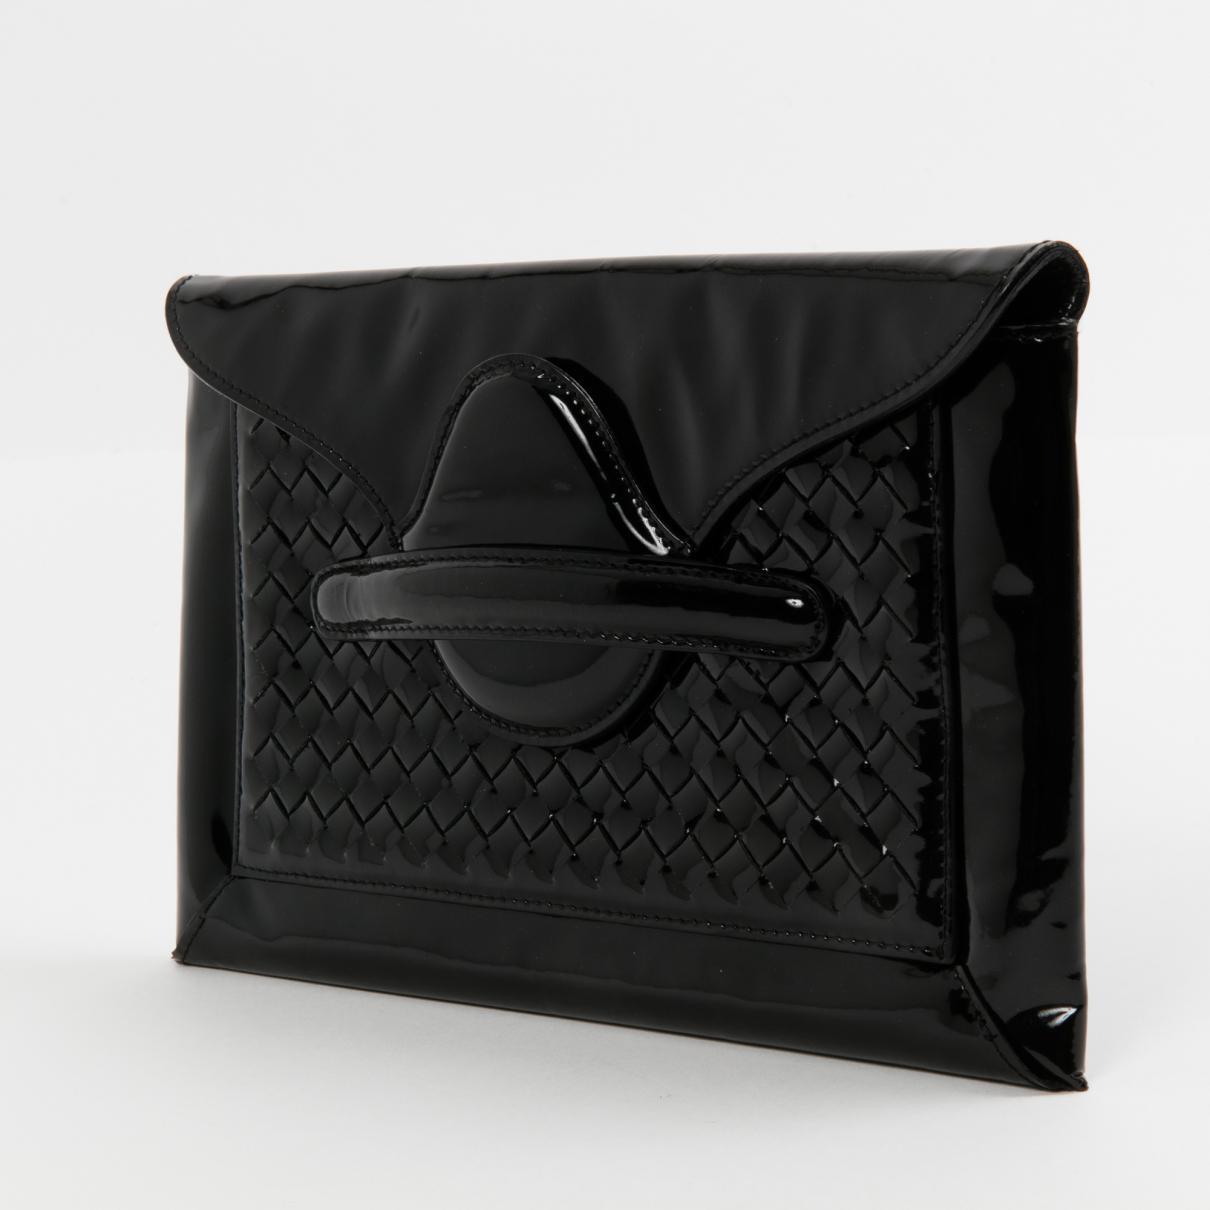 Bottega Veneta Pre-owned - Patent leather clutch bag bKuj07T